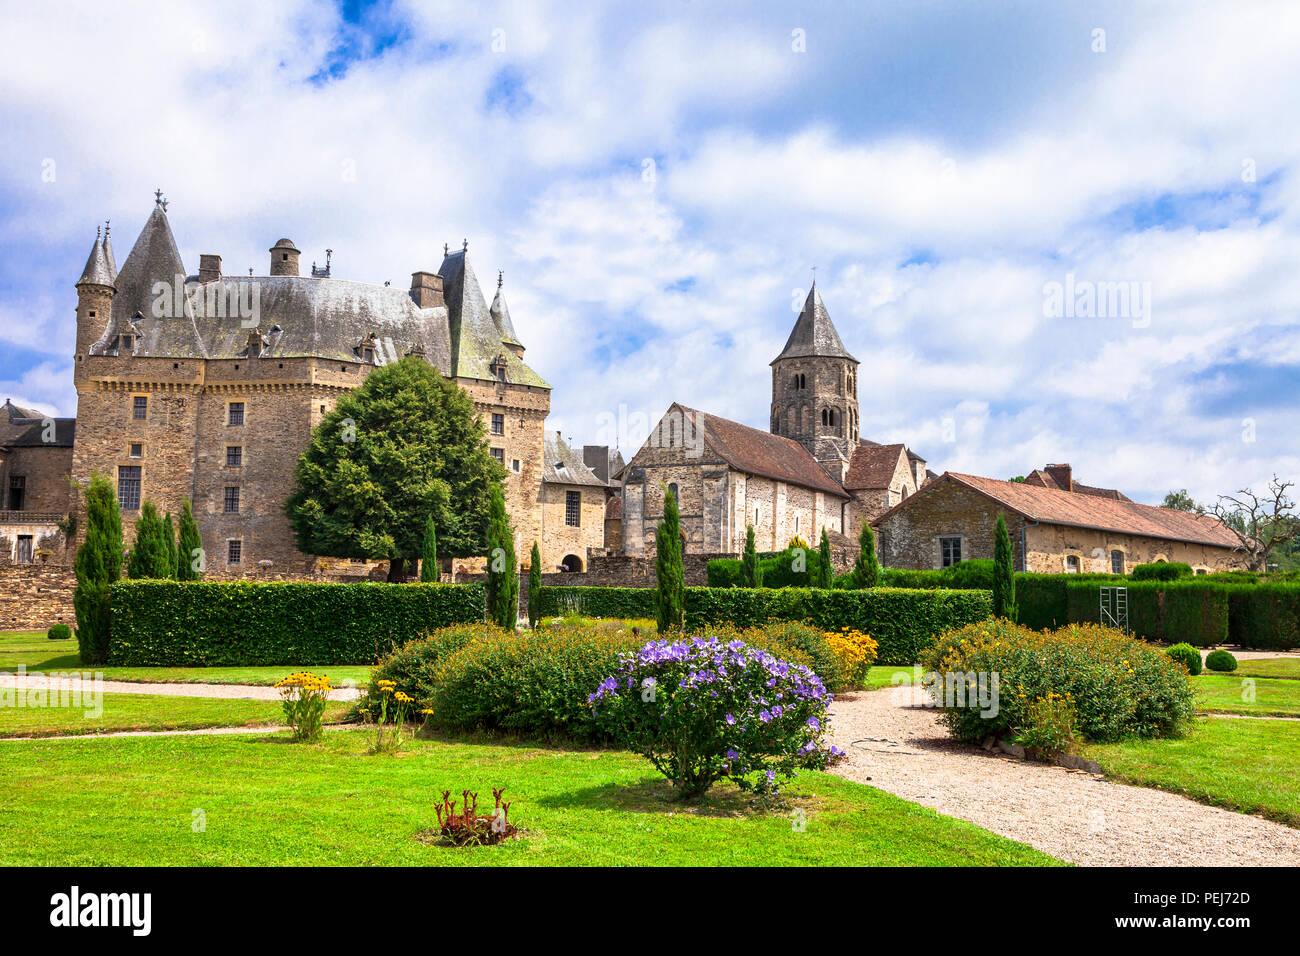 Beautiful Jumilhac le grand medieval castle,France. - Stock Image